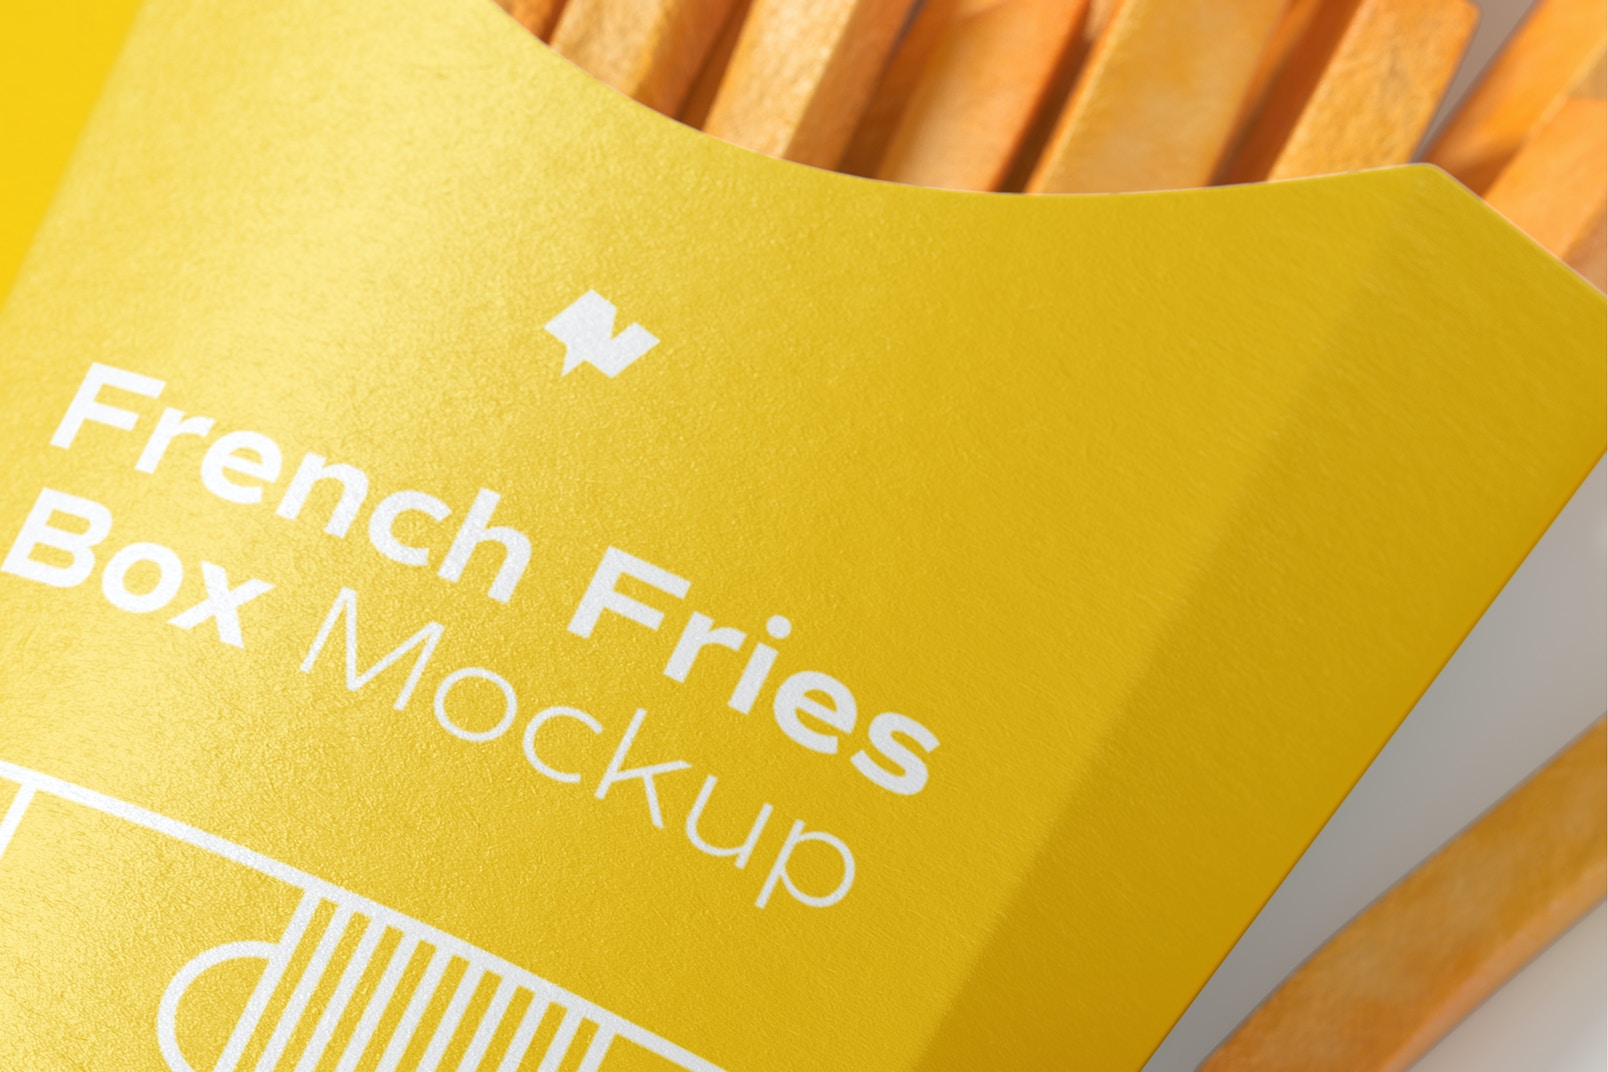 French Fries Box Mockup, Close Up